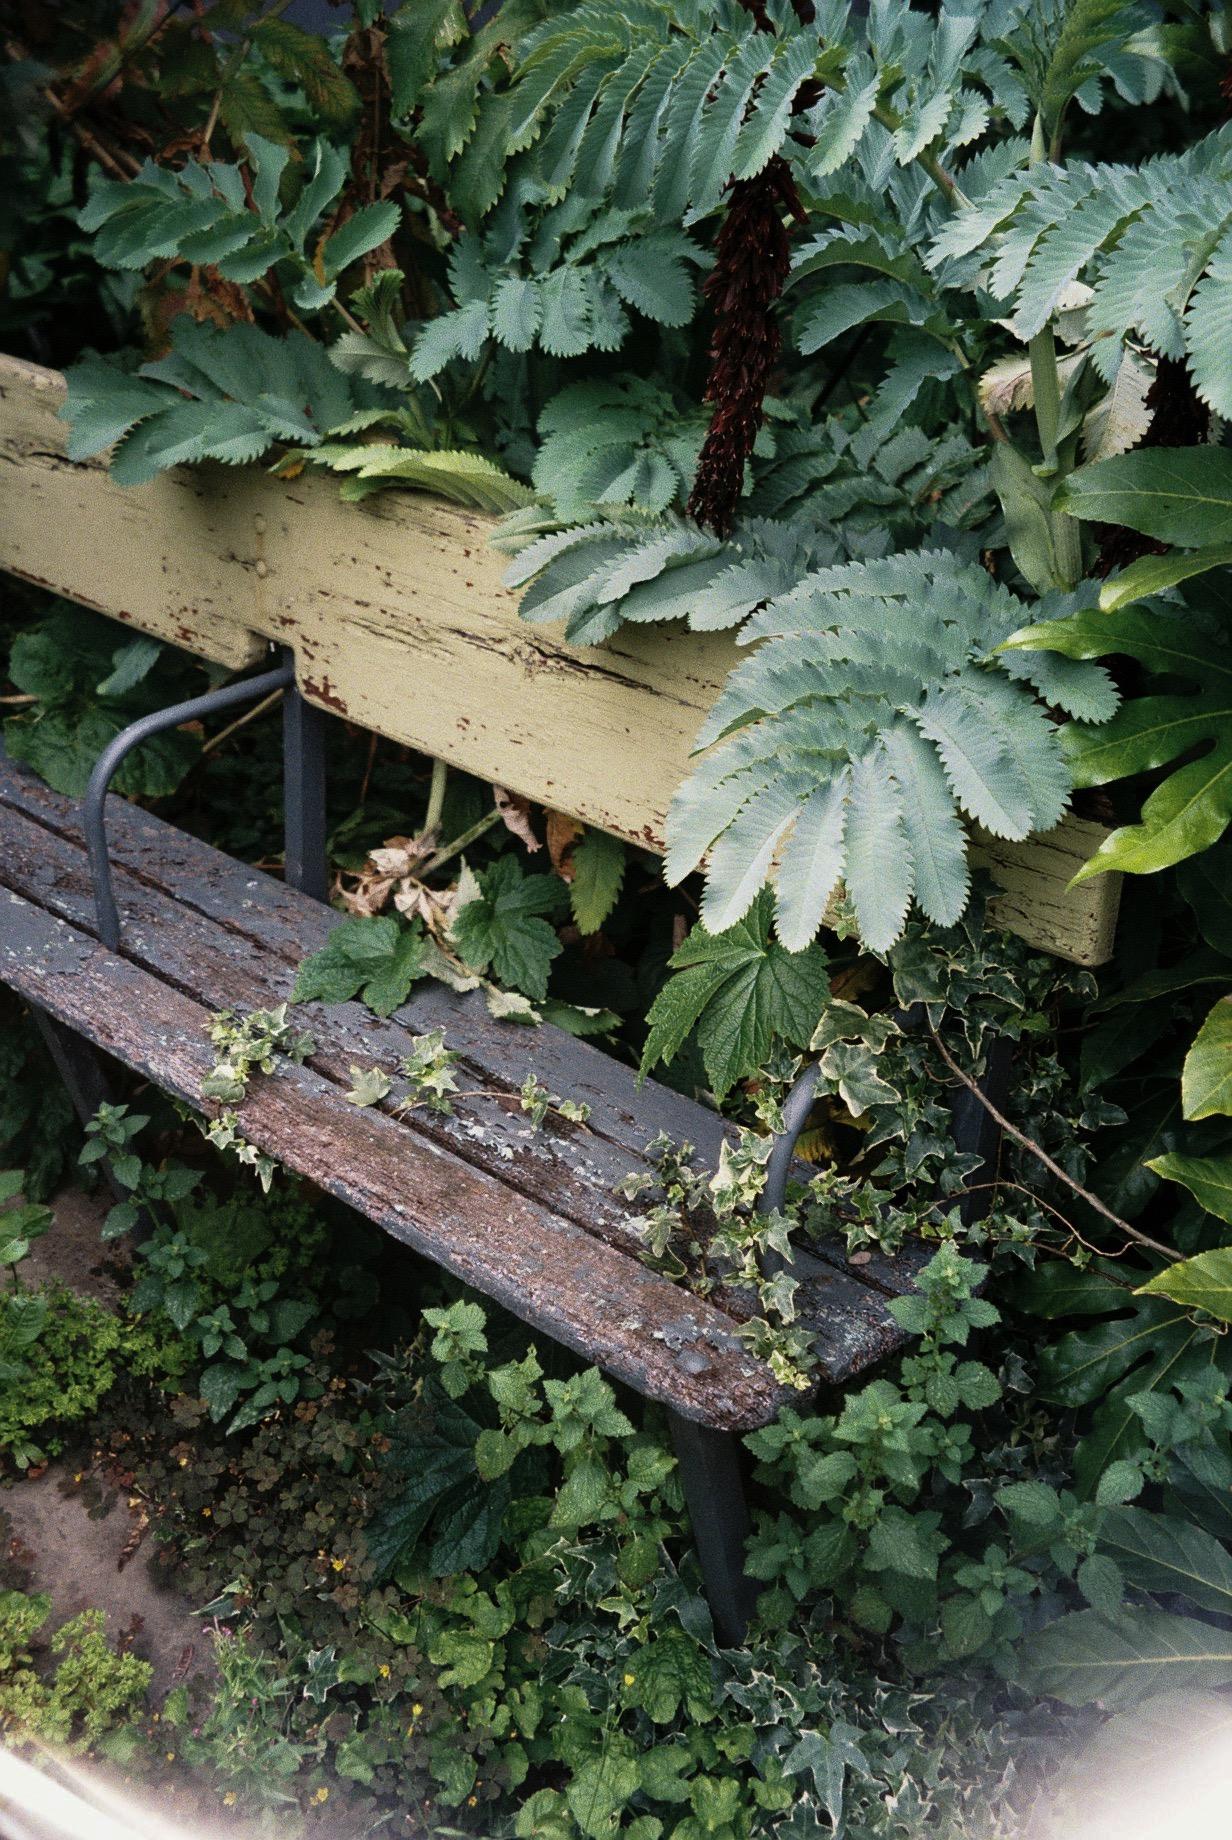 A bench being eaten by Mother Nature.  / Banco de rua em Hackney a ser comigo pela natureza.